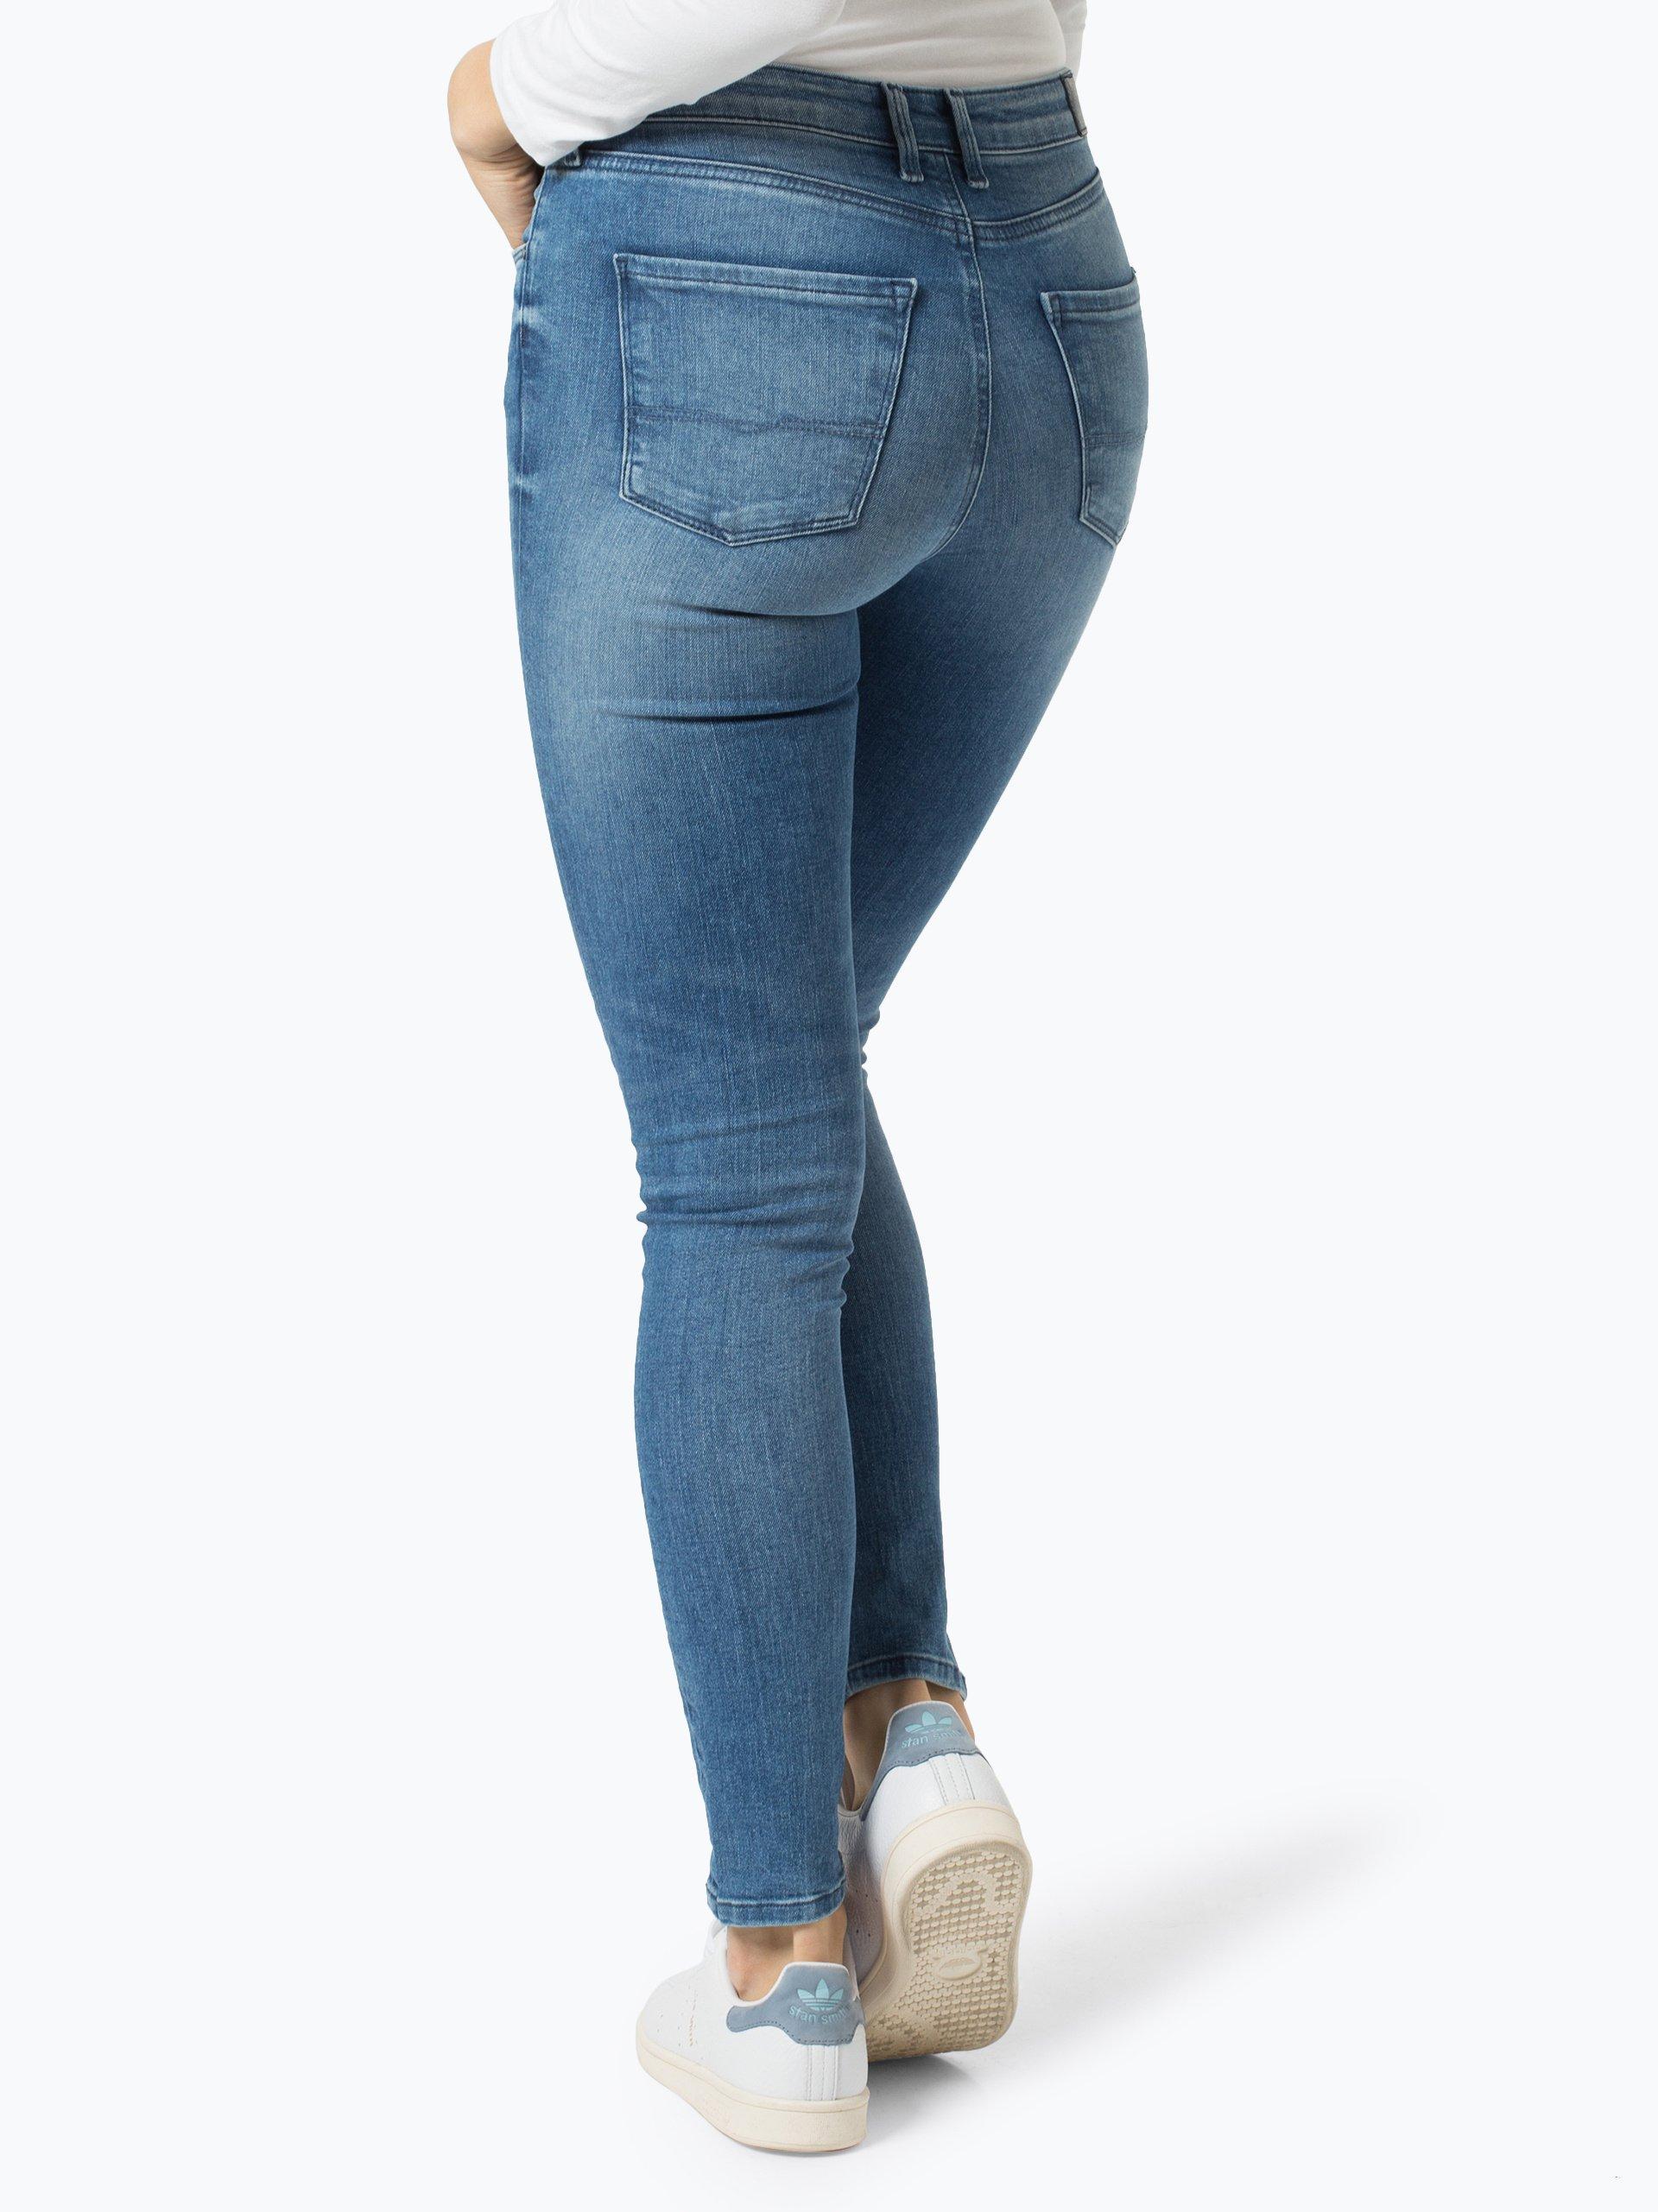 pepe jeans damen jeans regent blau uni online kaufen. Black Bedroom Furniture Sets. Home Design Ideas